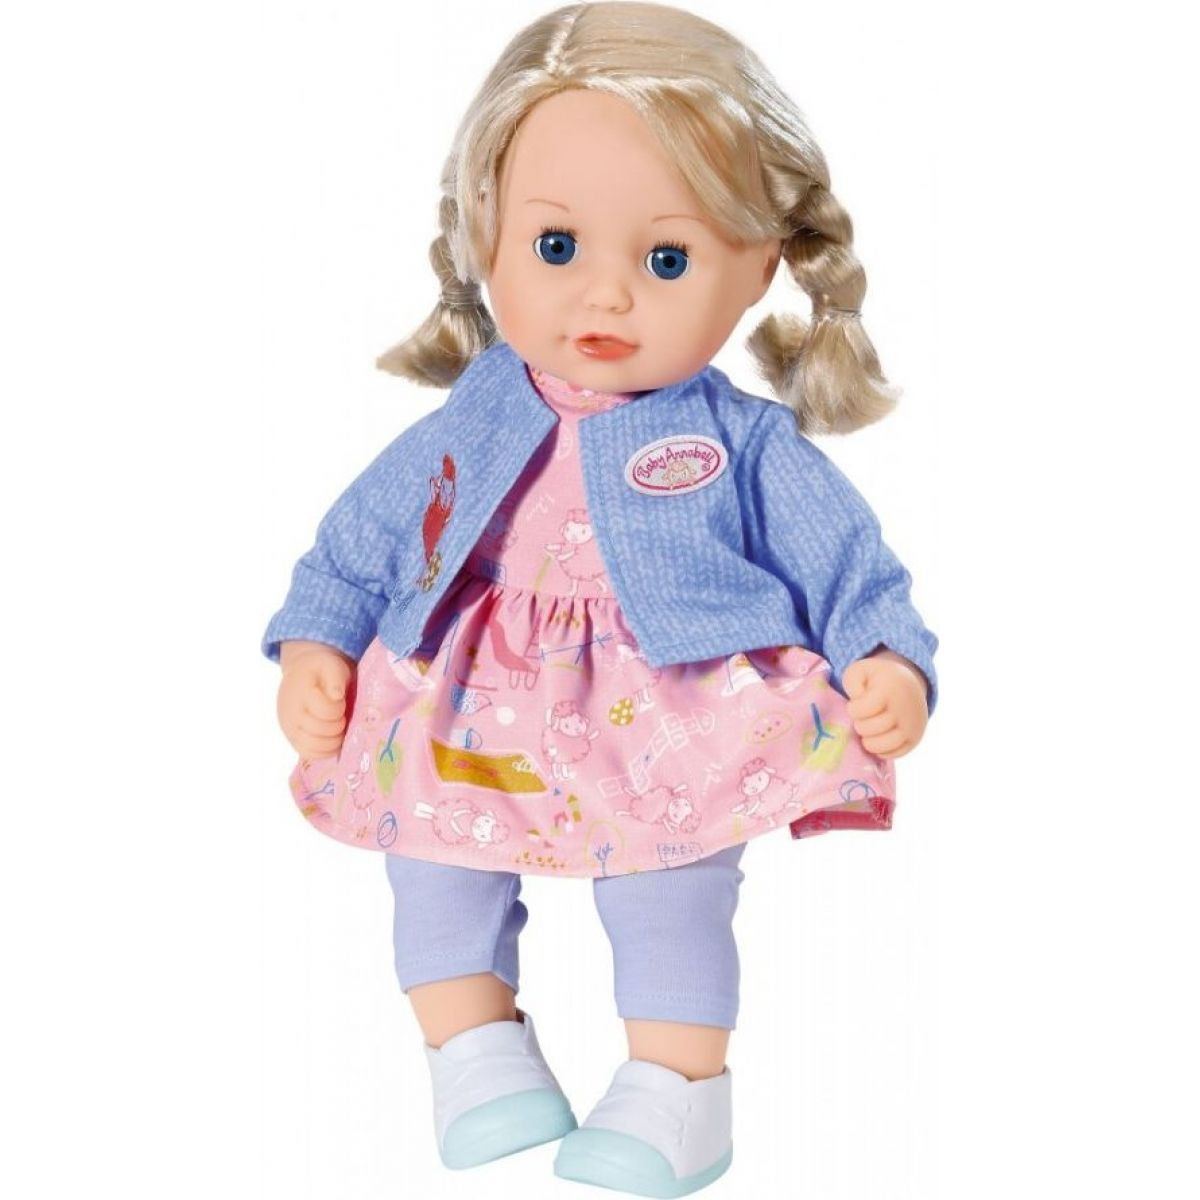 Zapf Creation Baby Annabell Little Soft Sophia 36 cm